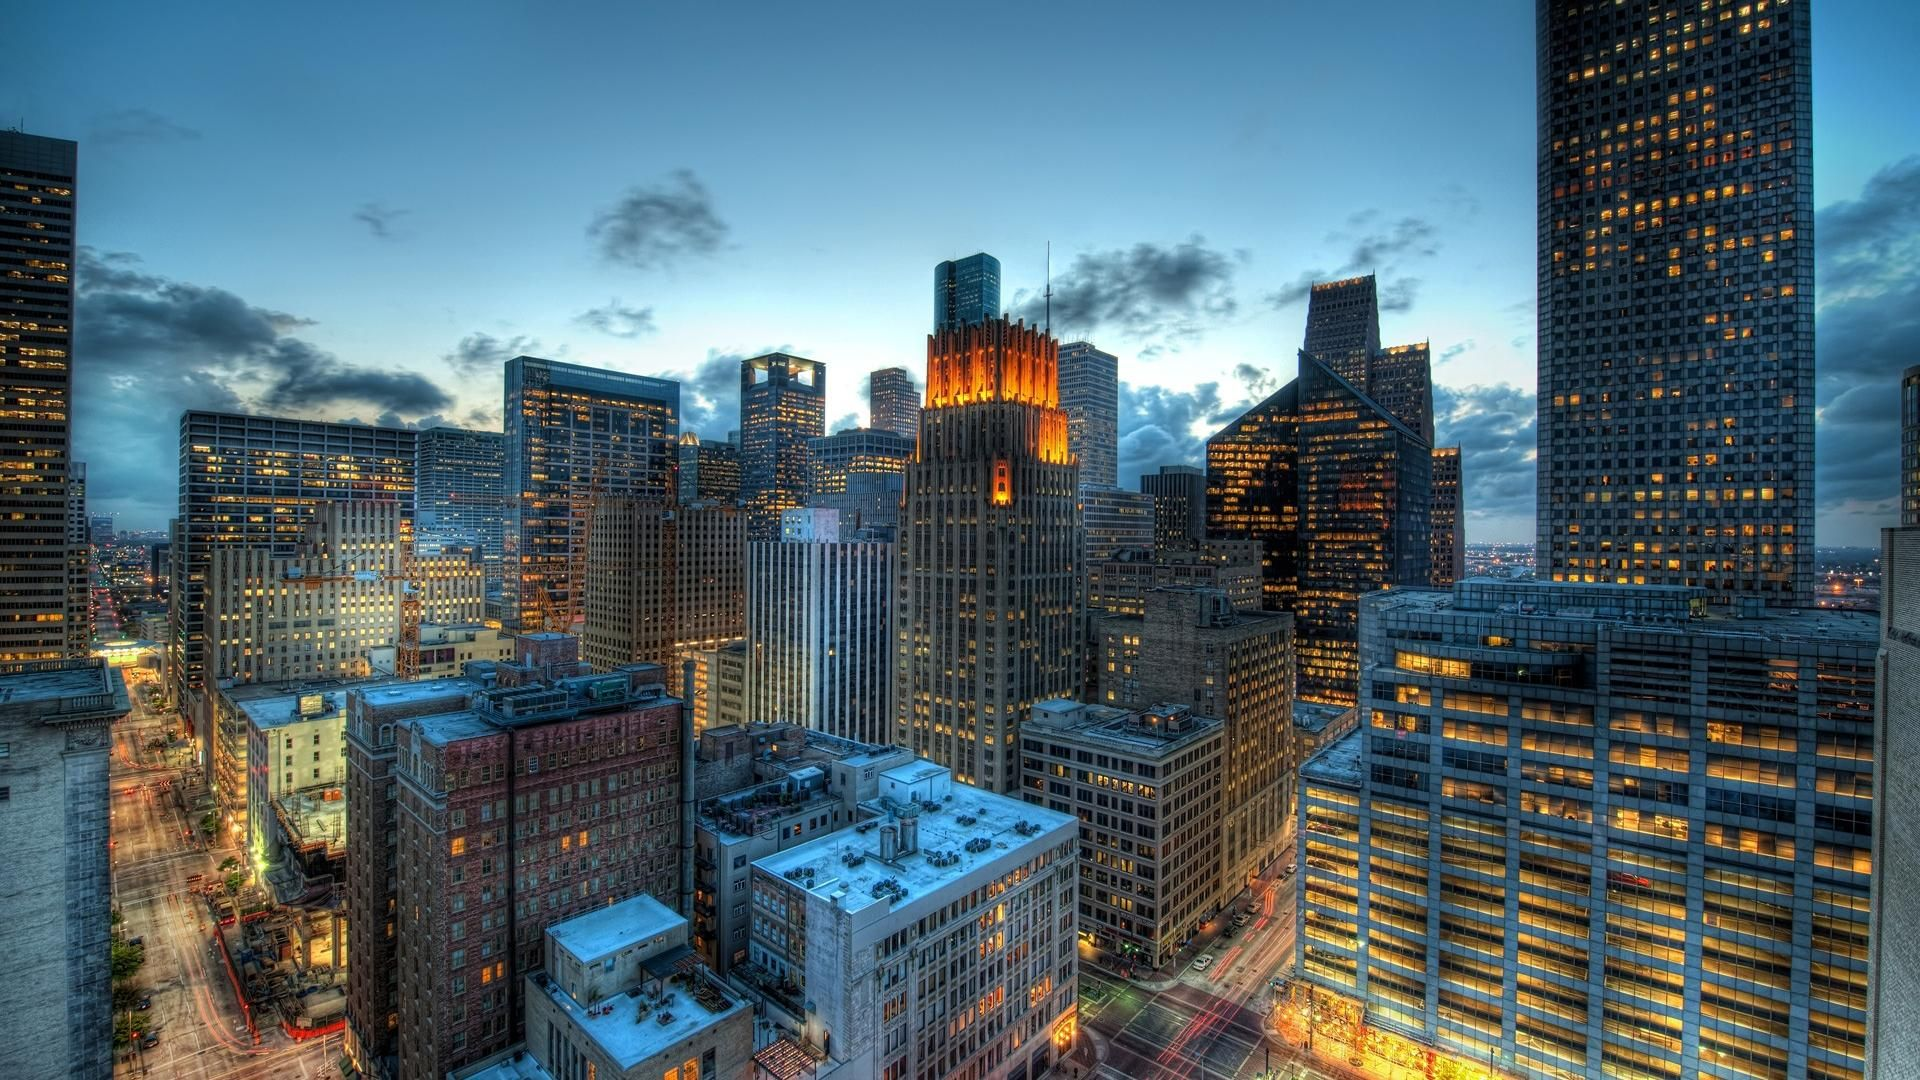 City landscape photo